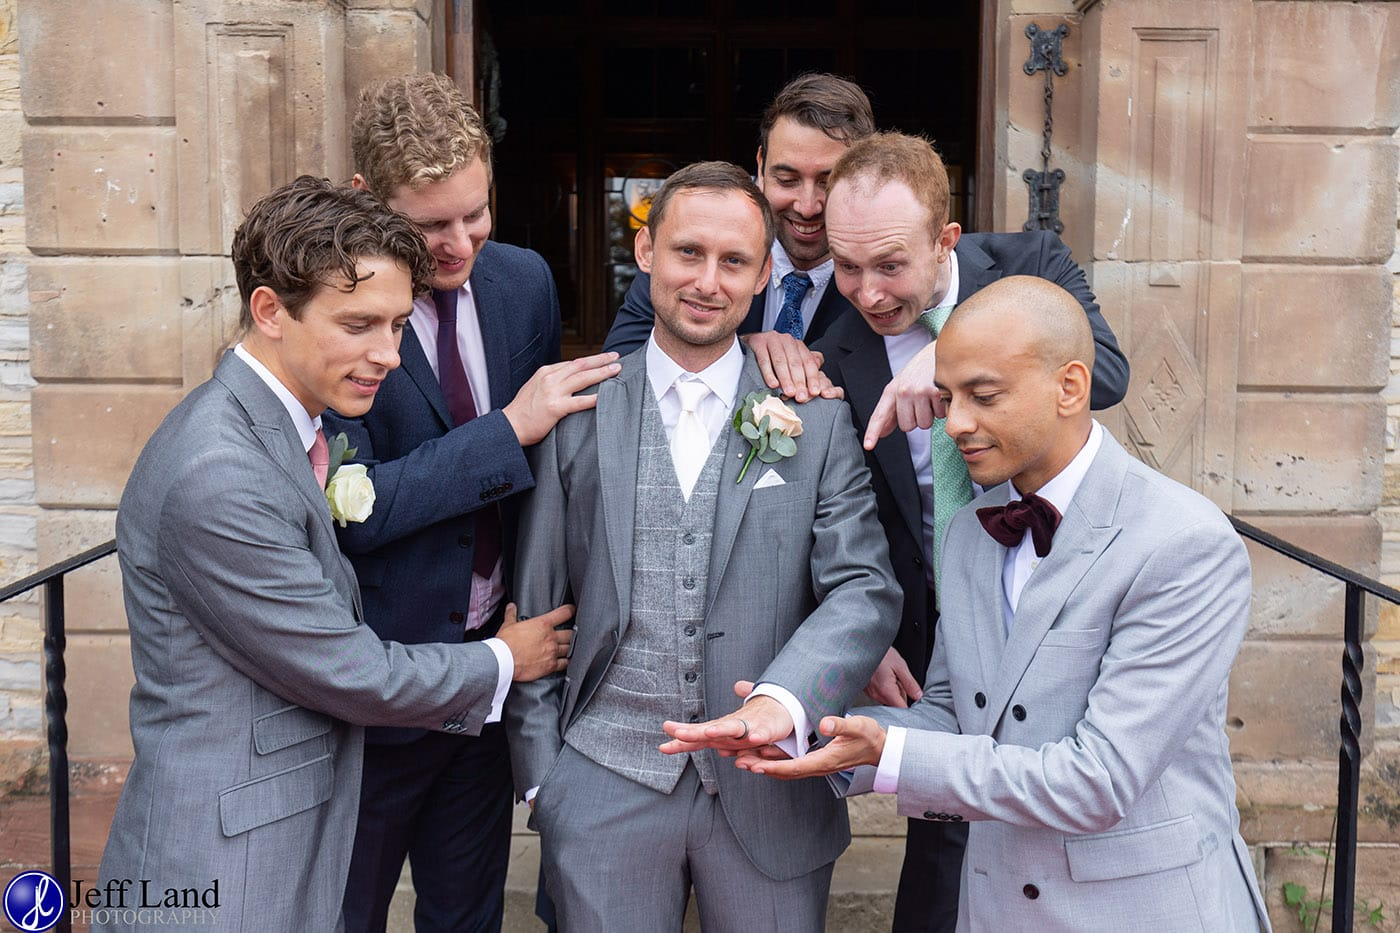 Billesley Manor Fun Wedding Photo